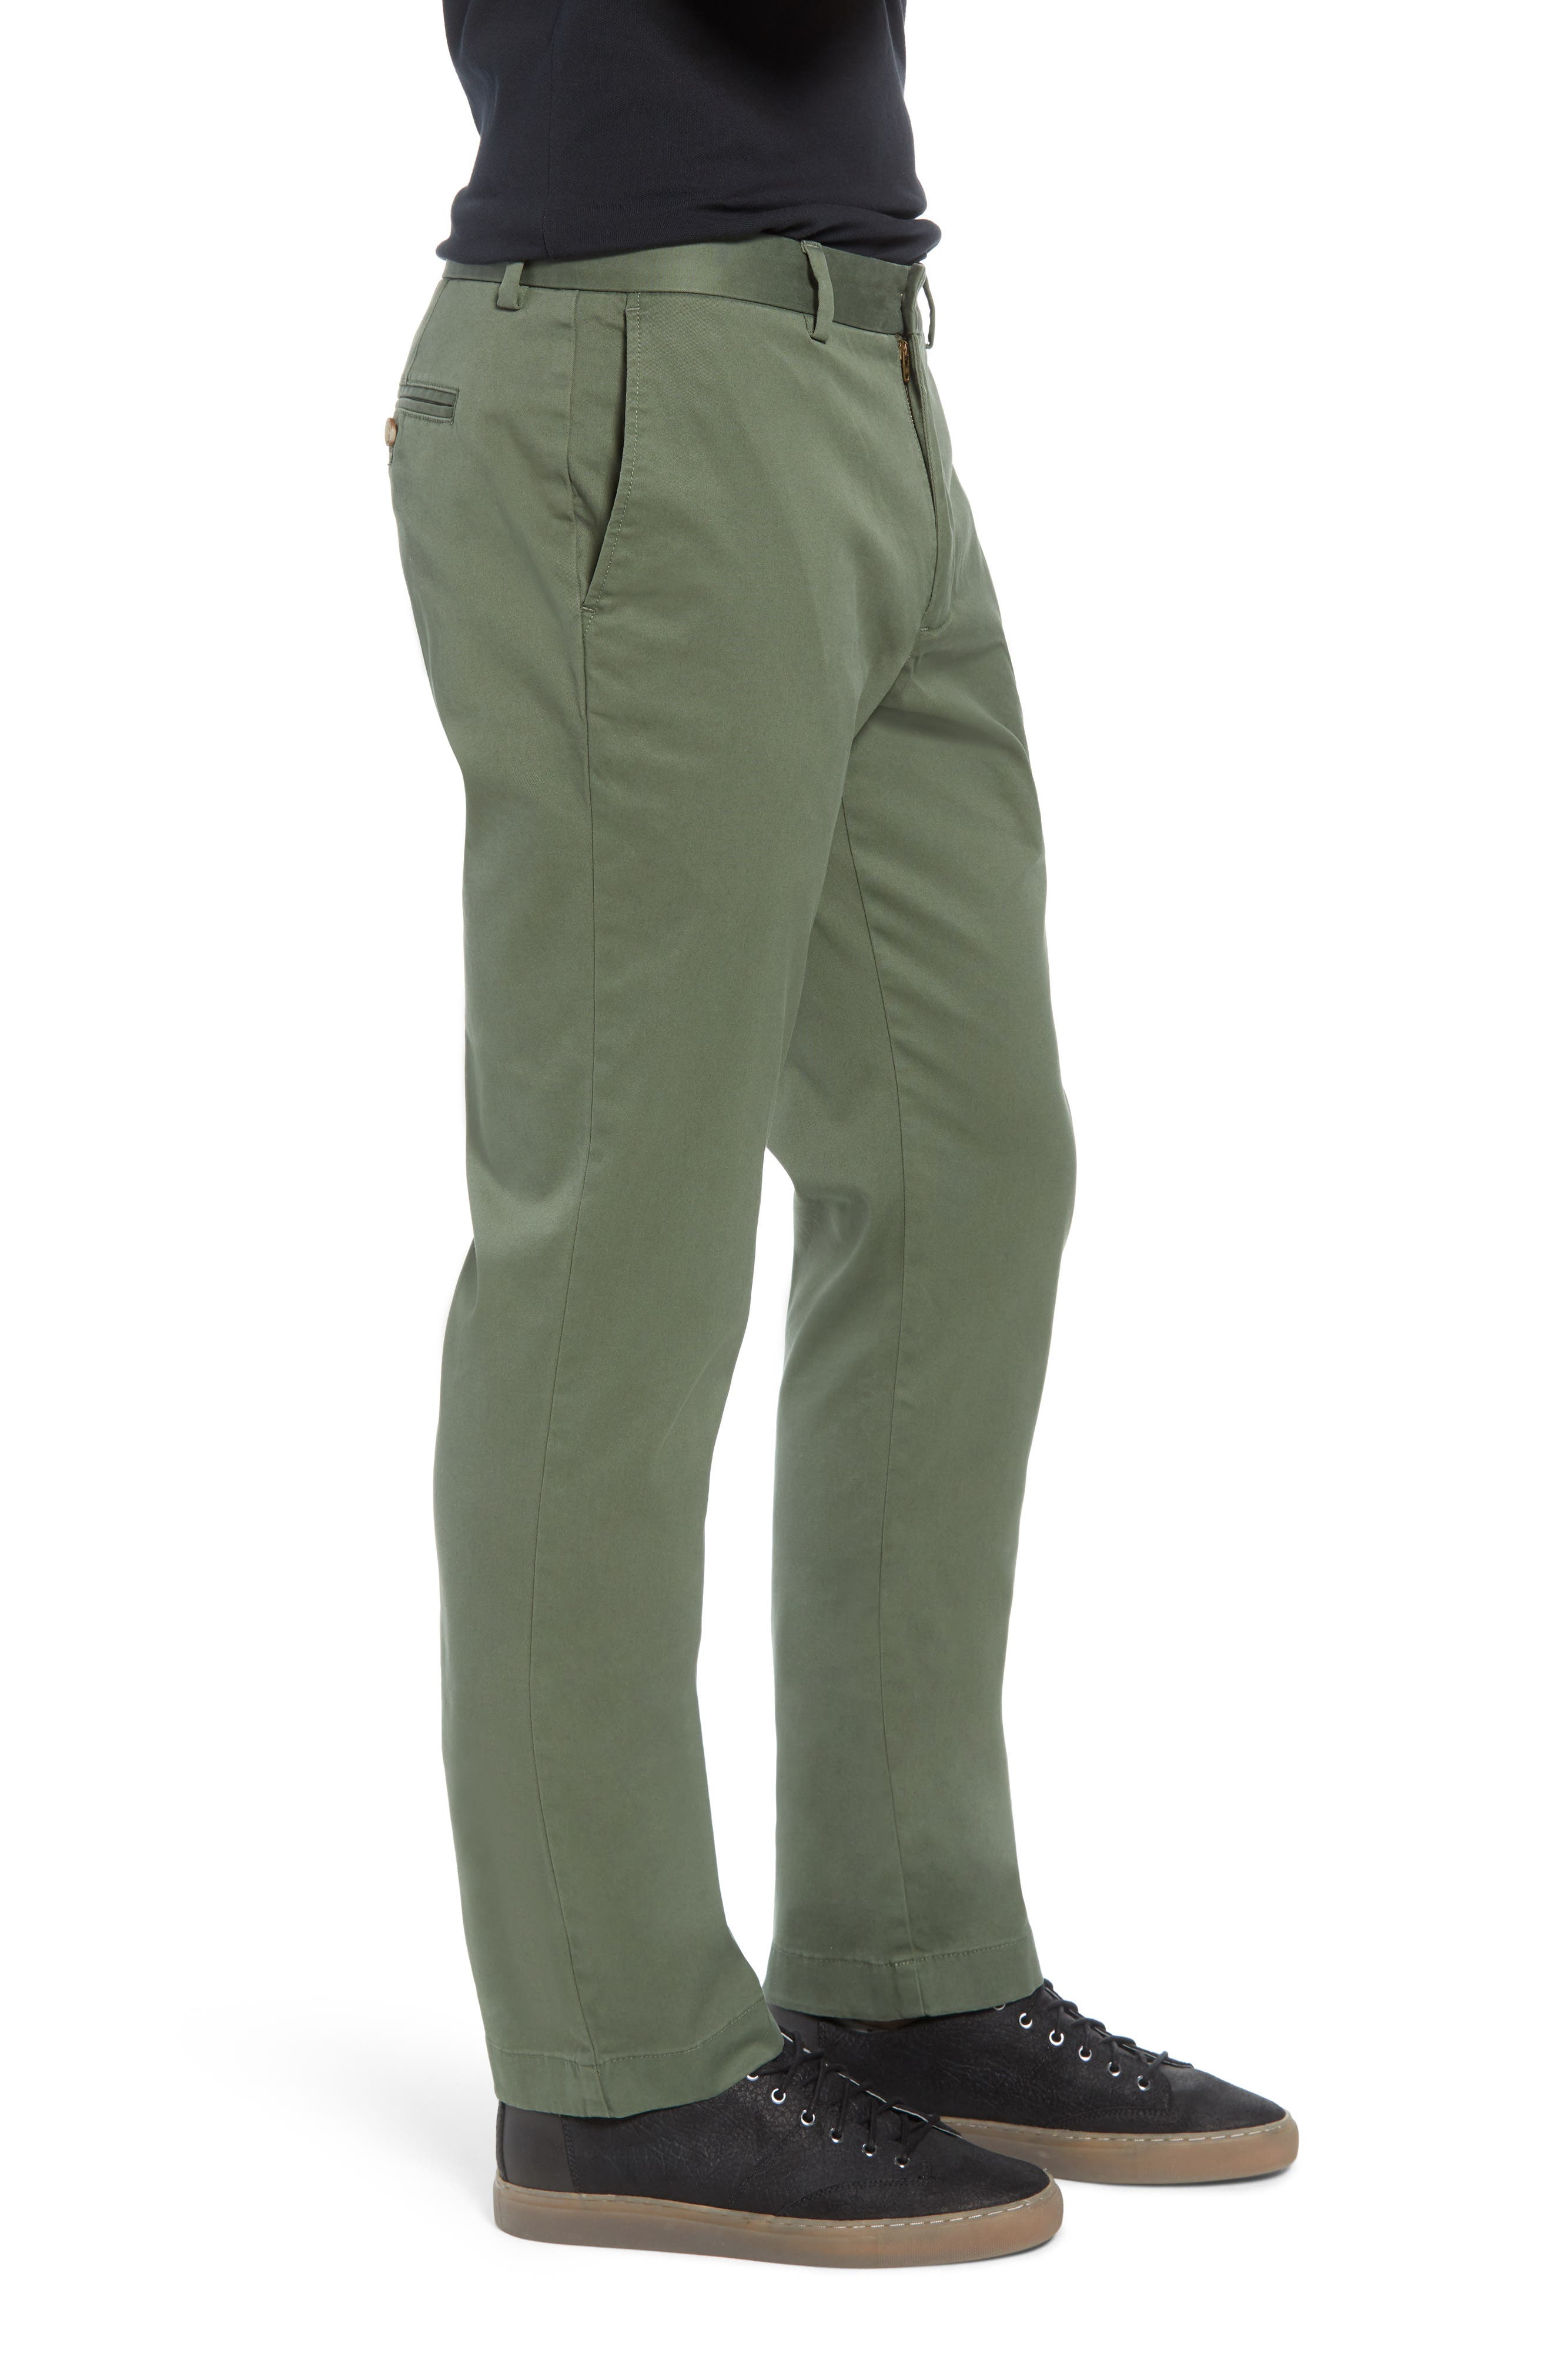 VINEYARD VINES, Breaker Flat Front Stretch Cotton Pants, Alternate thumbnail 4, color, CARGO GREEN